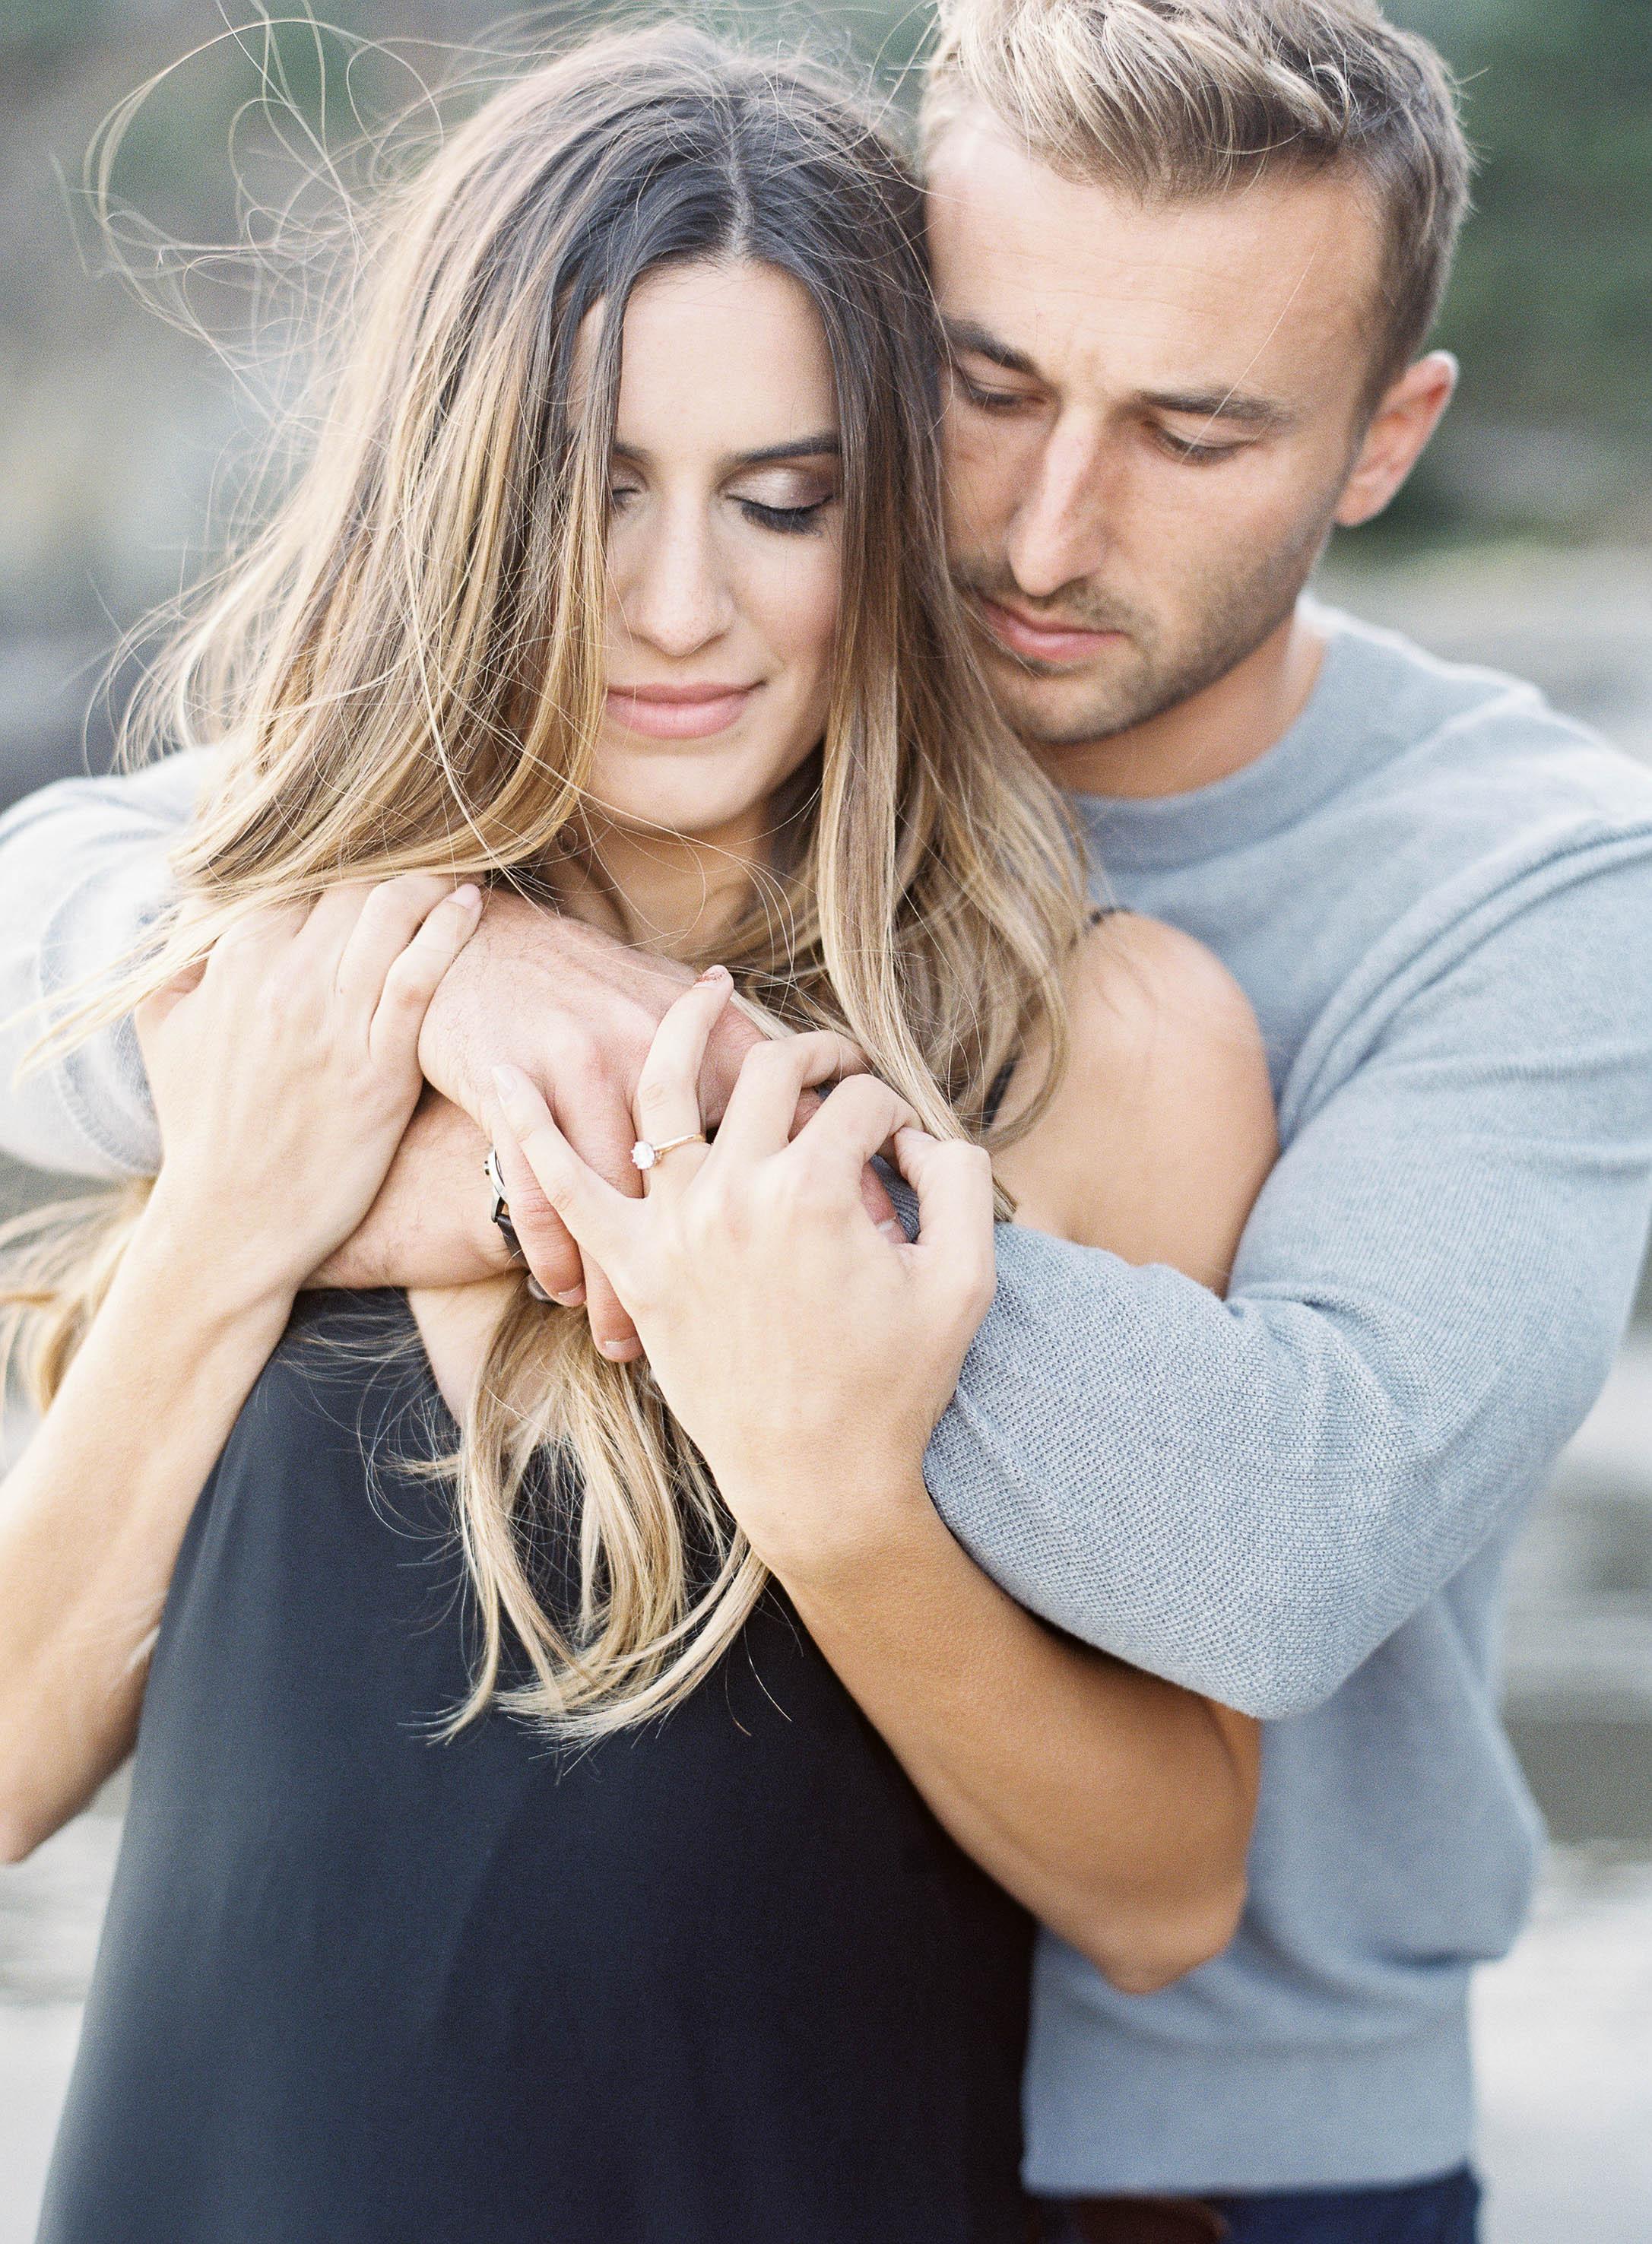 Meghan Mehan Photography - Fine Art Film Wedding Photography - San Francisco | Napa | Sonoma | Big Sur | Chicago | Minneapolis | Milwaukee | Lake Geneva | Door County | Wisconsin 005.jpg